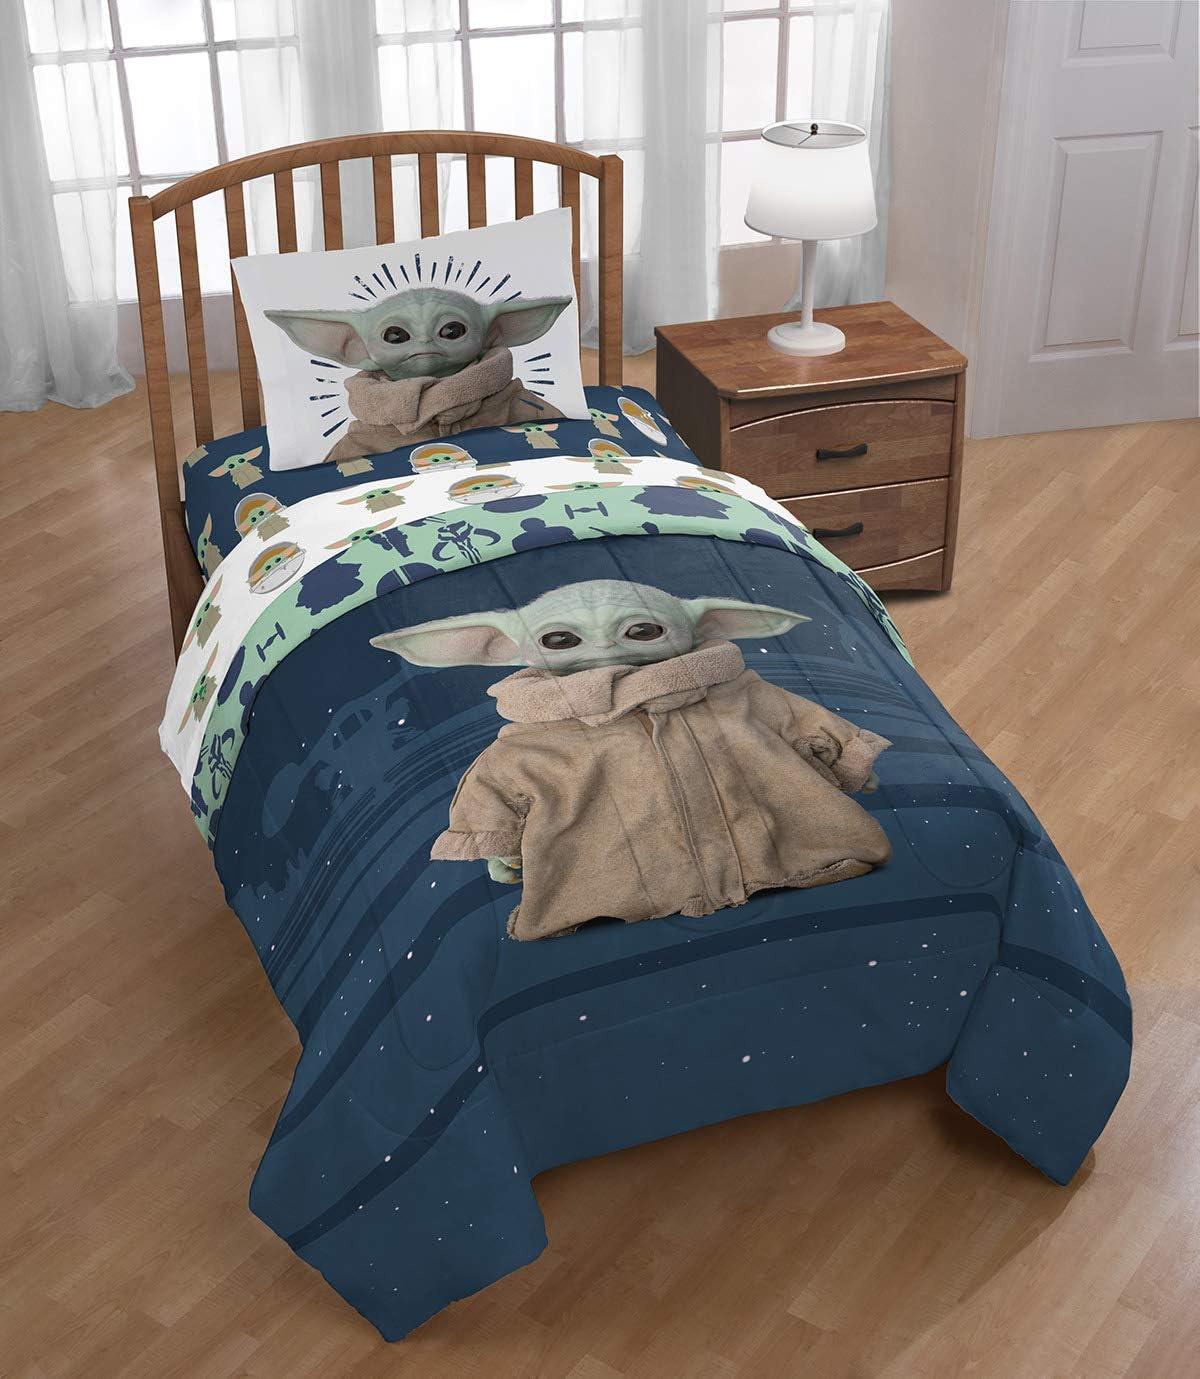 Star Wars The Mandalorian Baby Mag Yoda Twin Comforter Sheets 価格 実物